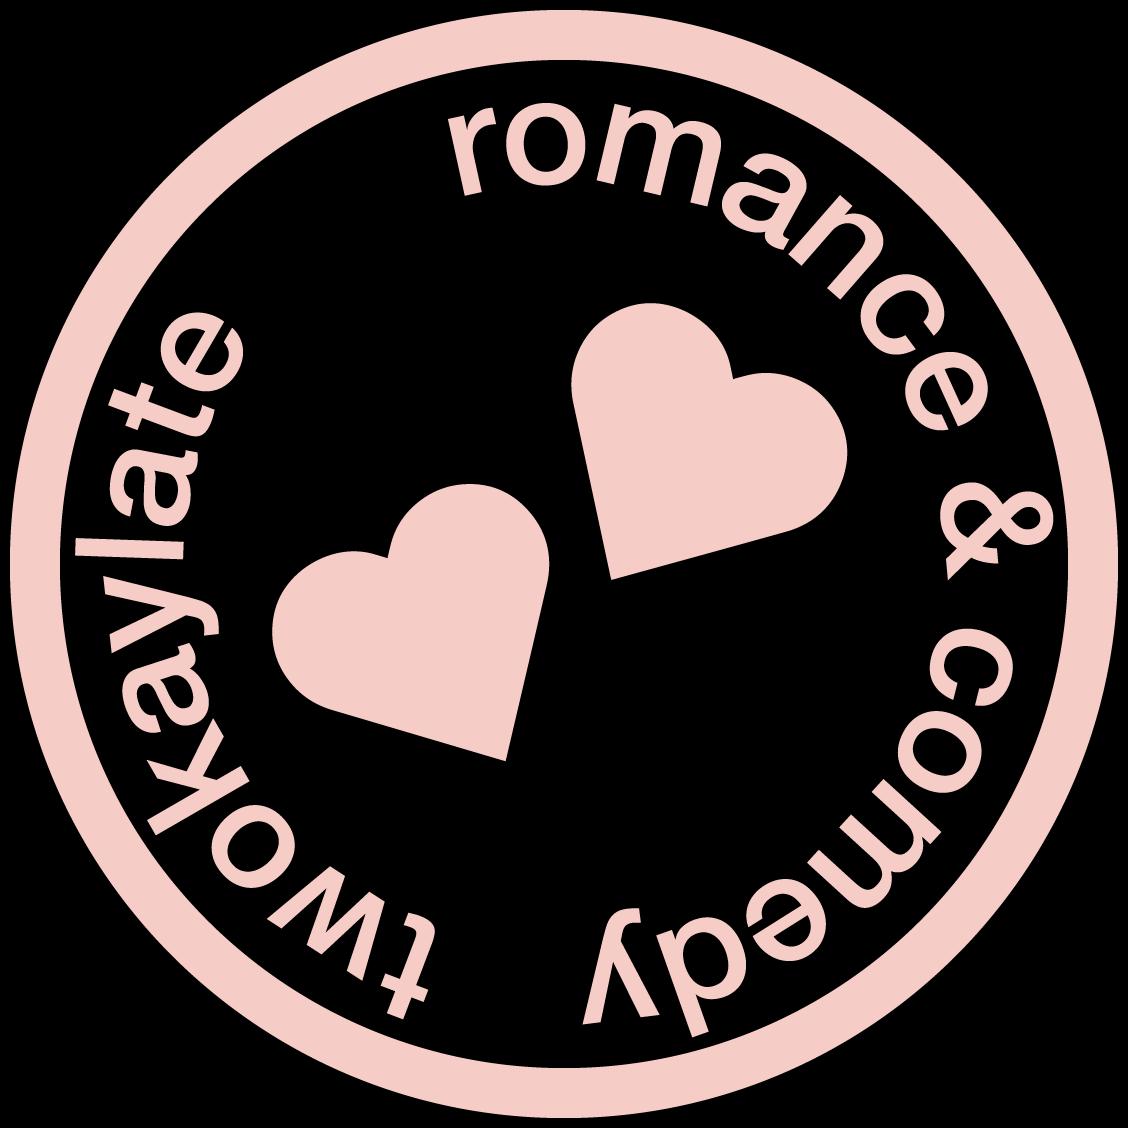 ROMCOMHEARTS_JPG.png